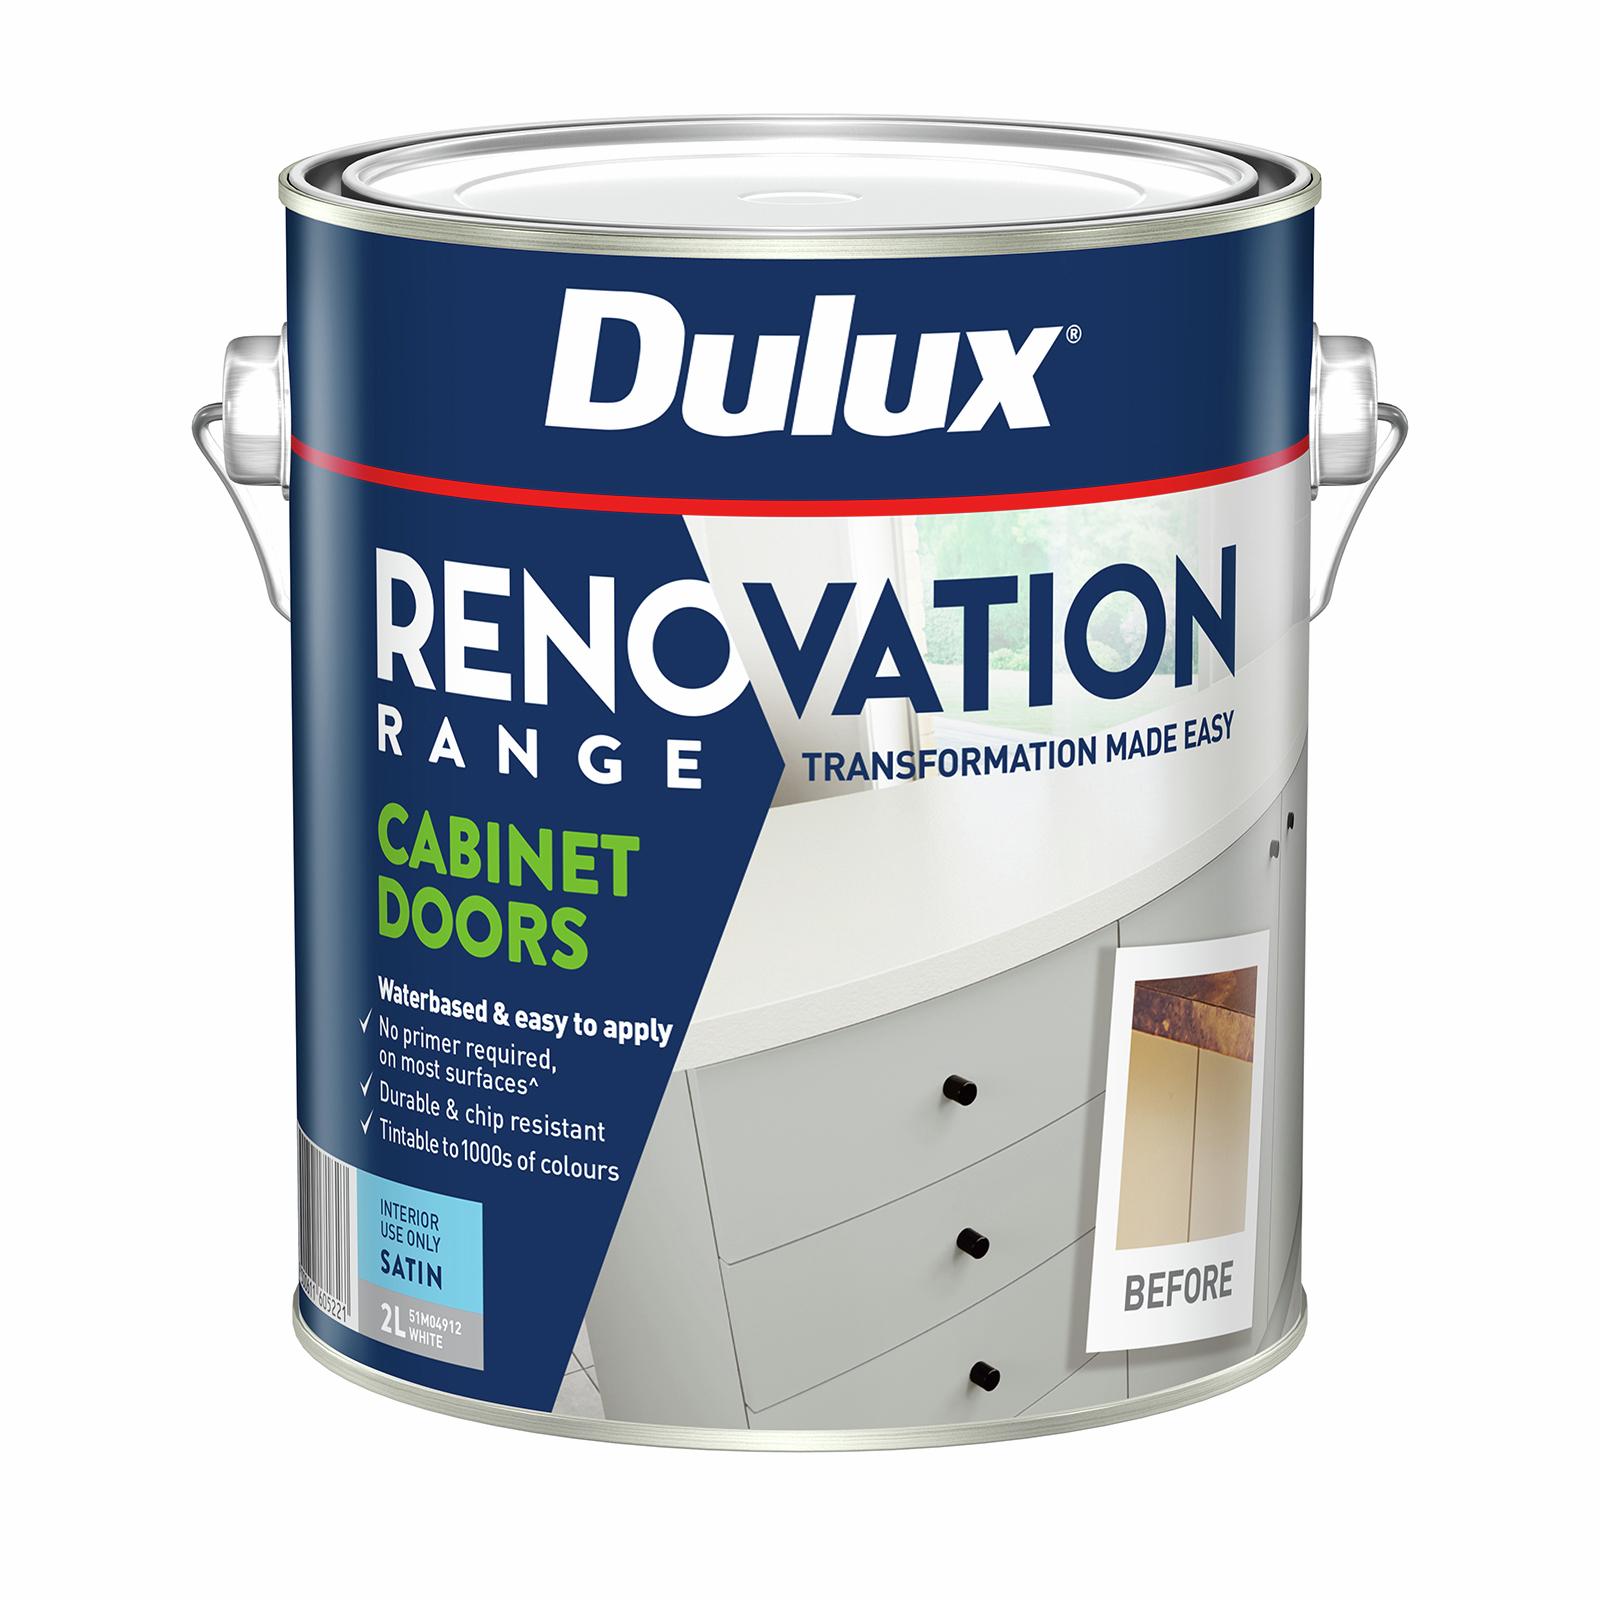 Dulux 2L Renovation Range Cabinet Doors Satin White